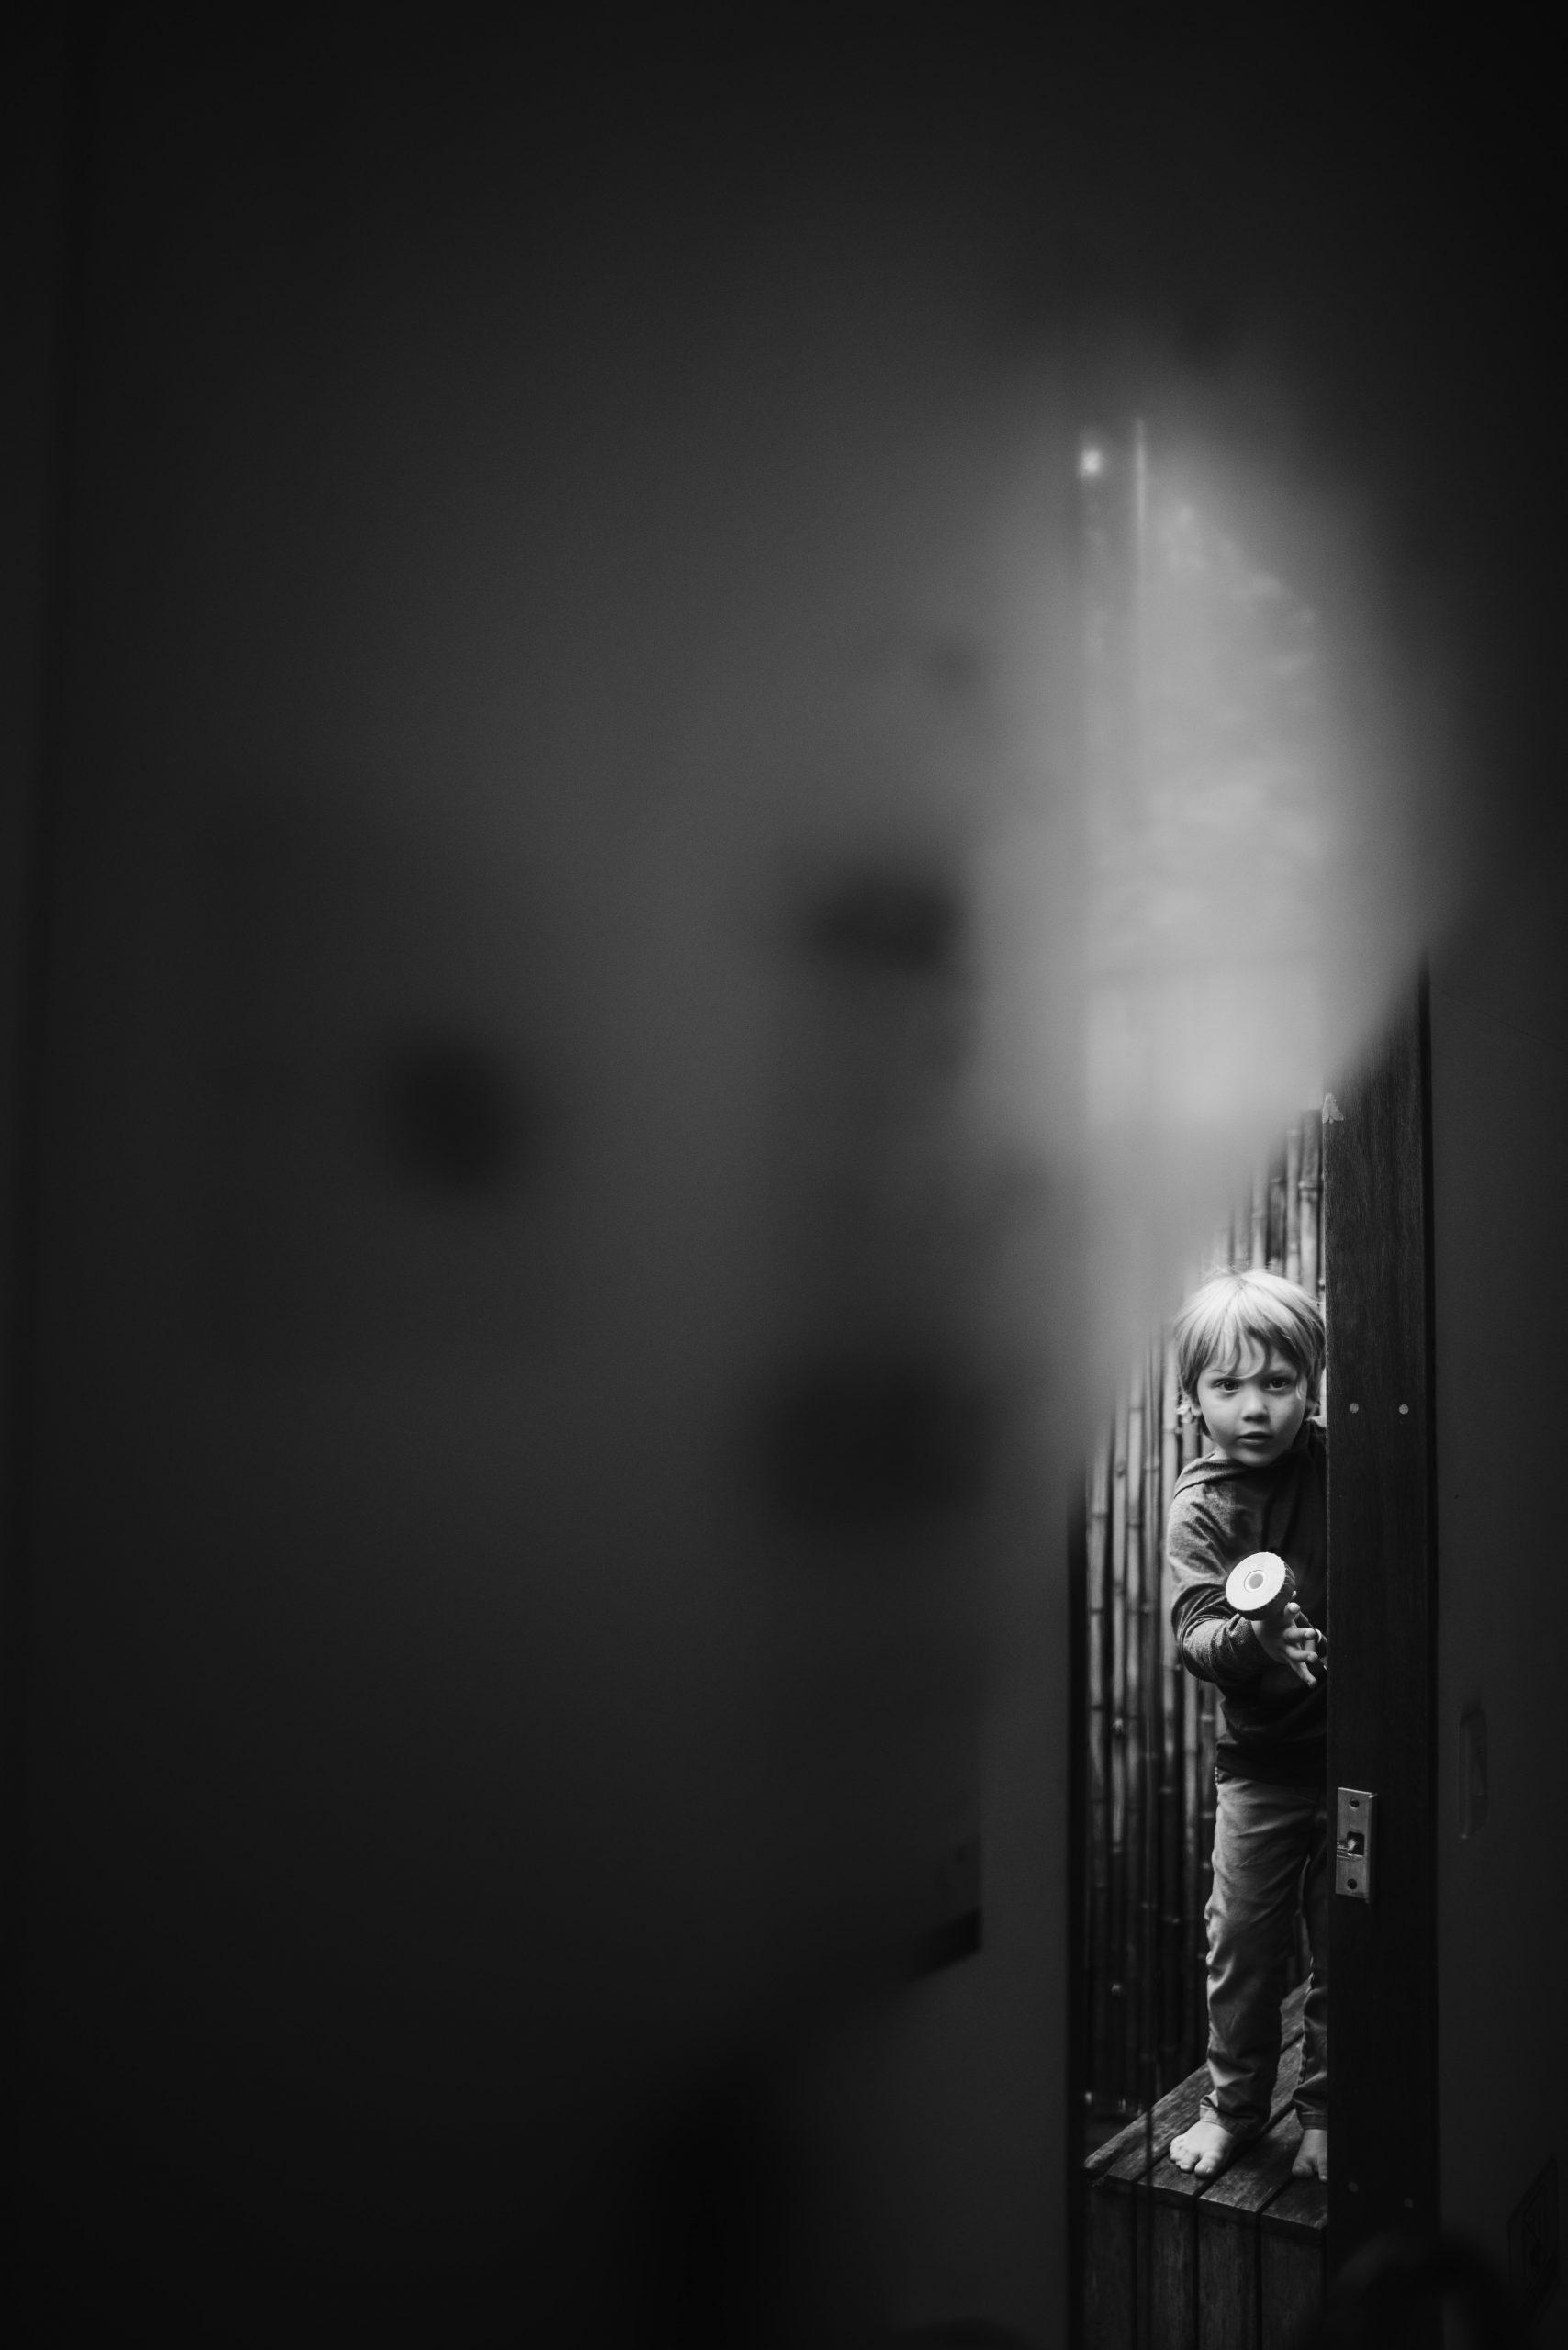 Mirror reflection of little boy